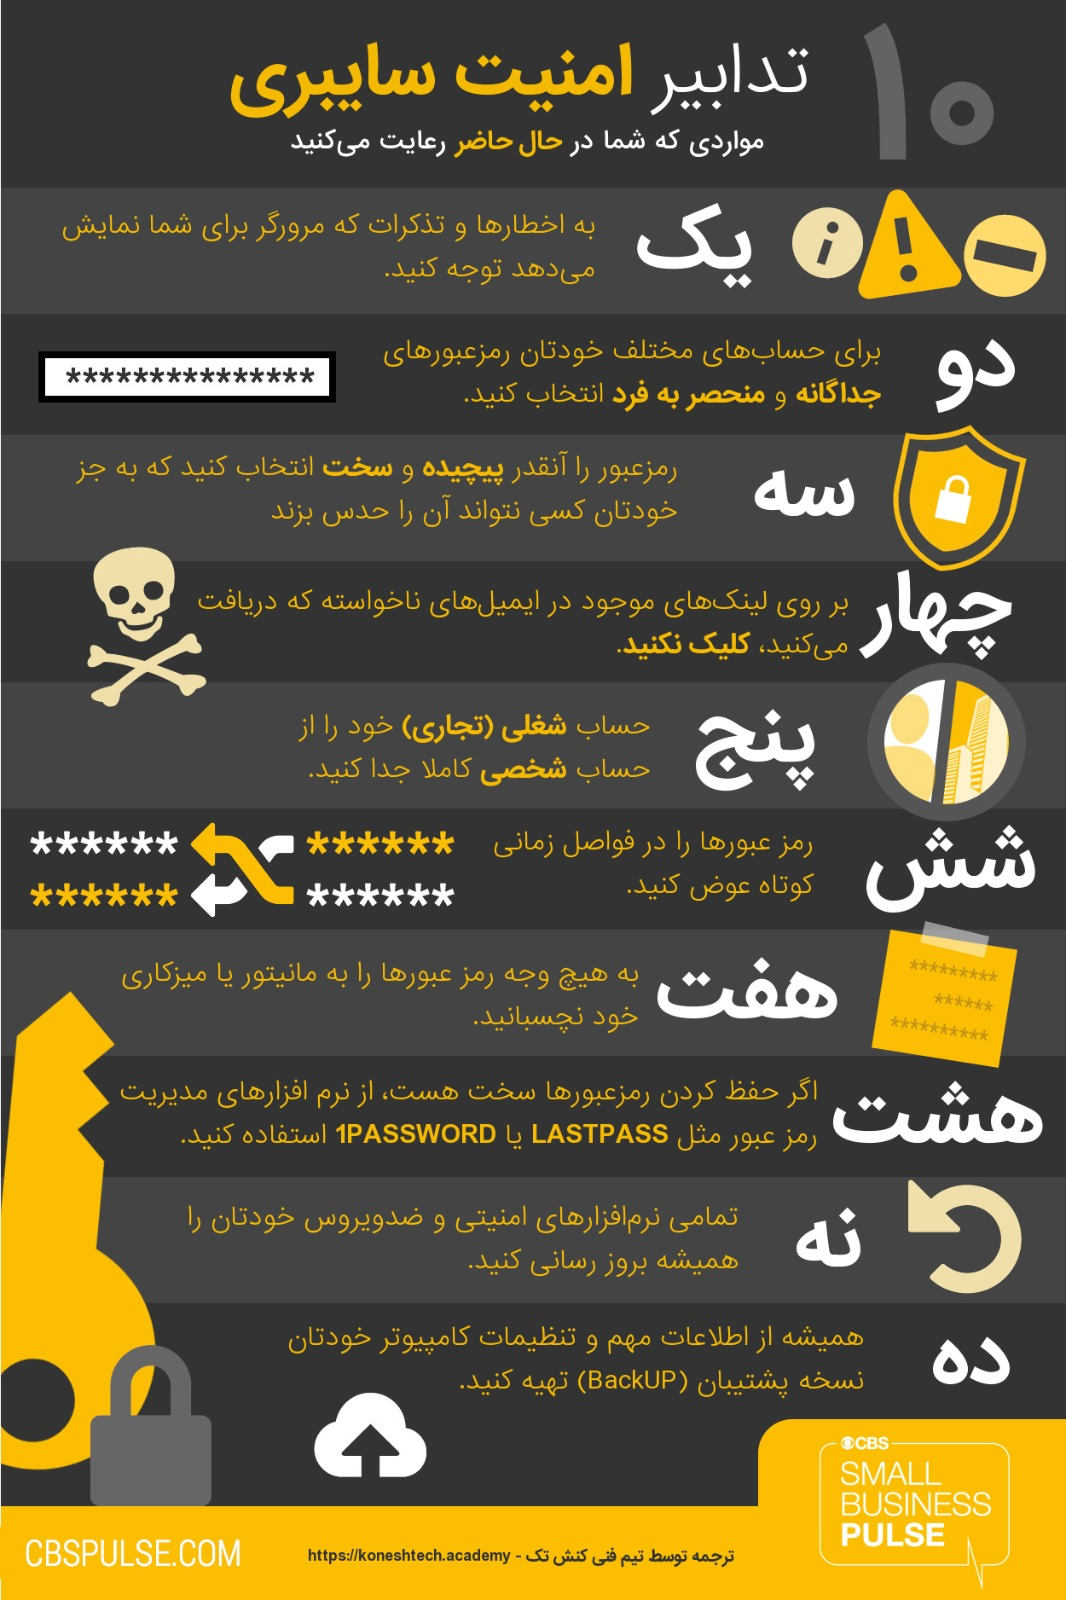 اینفوگرافیک تدابیر امنیت سایبری